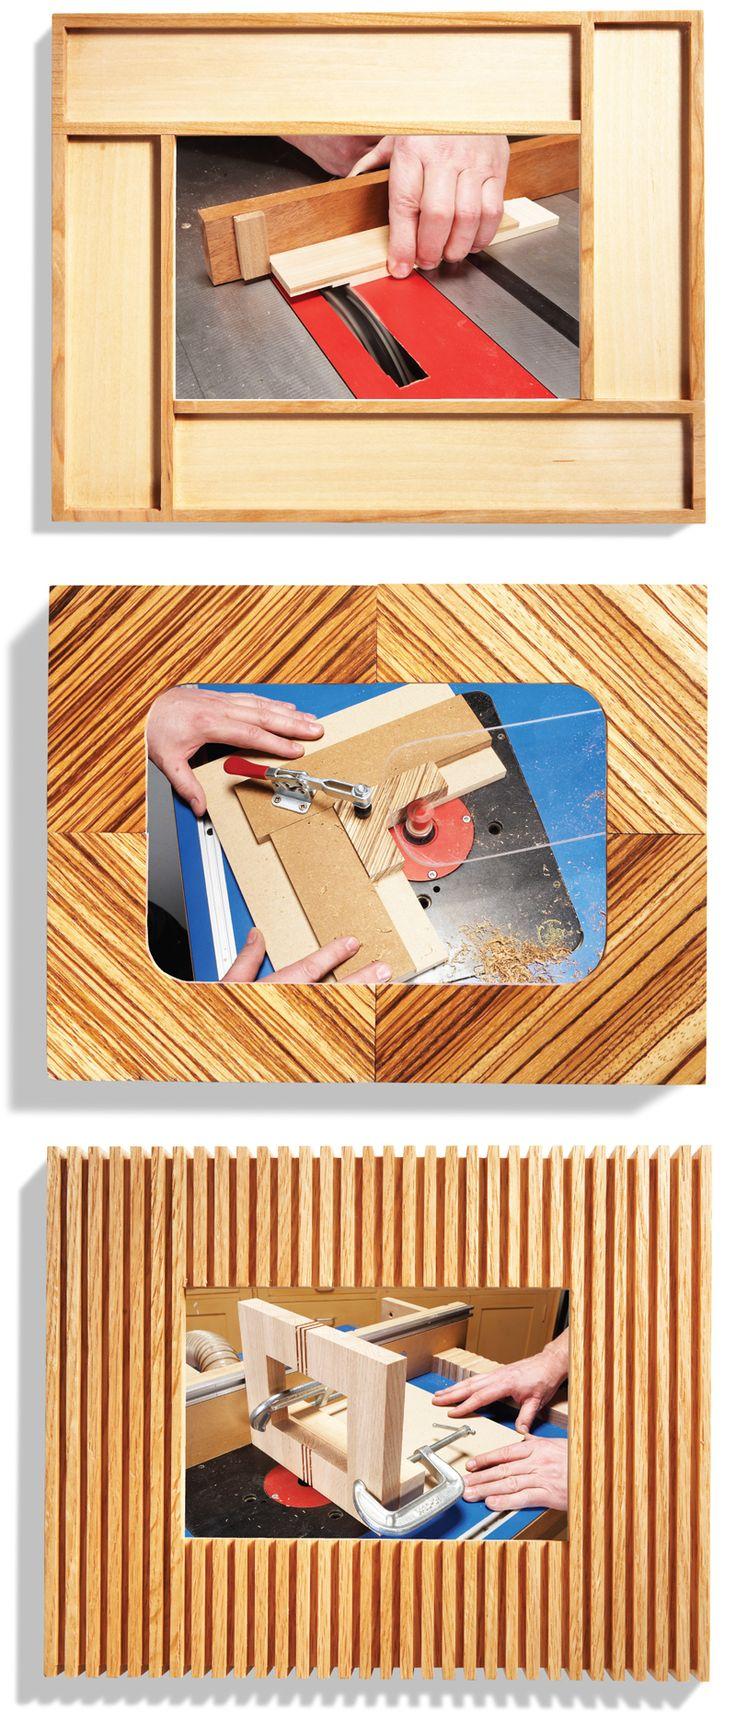 miter free picture frames popular woodworking magazine